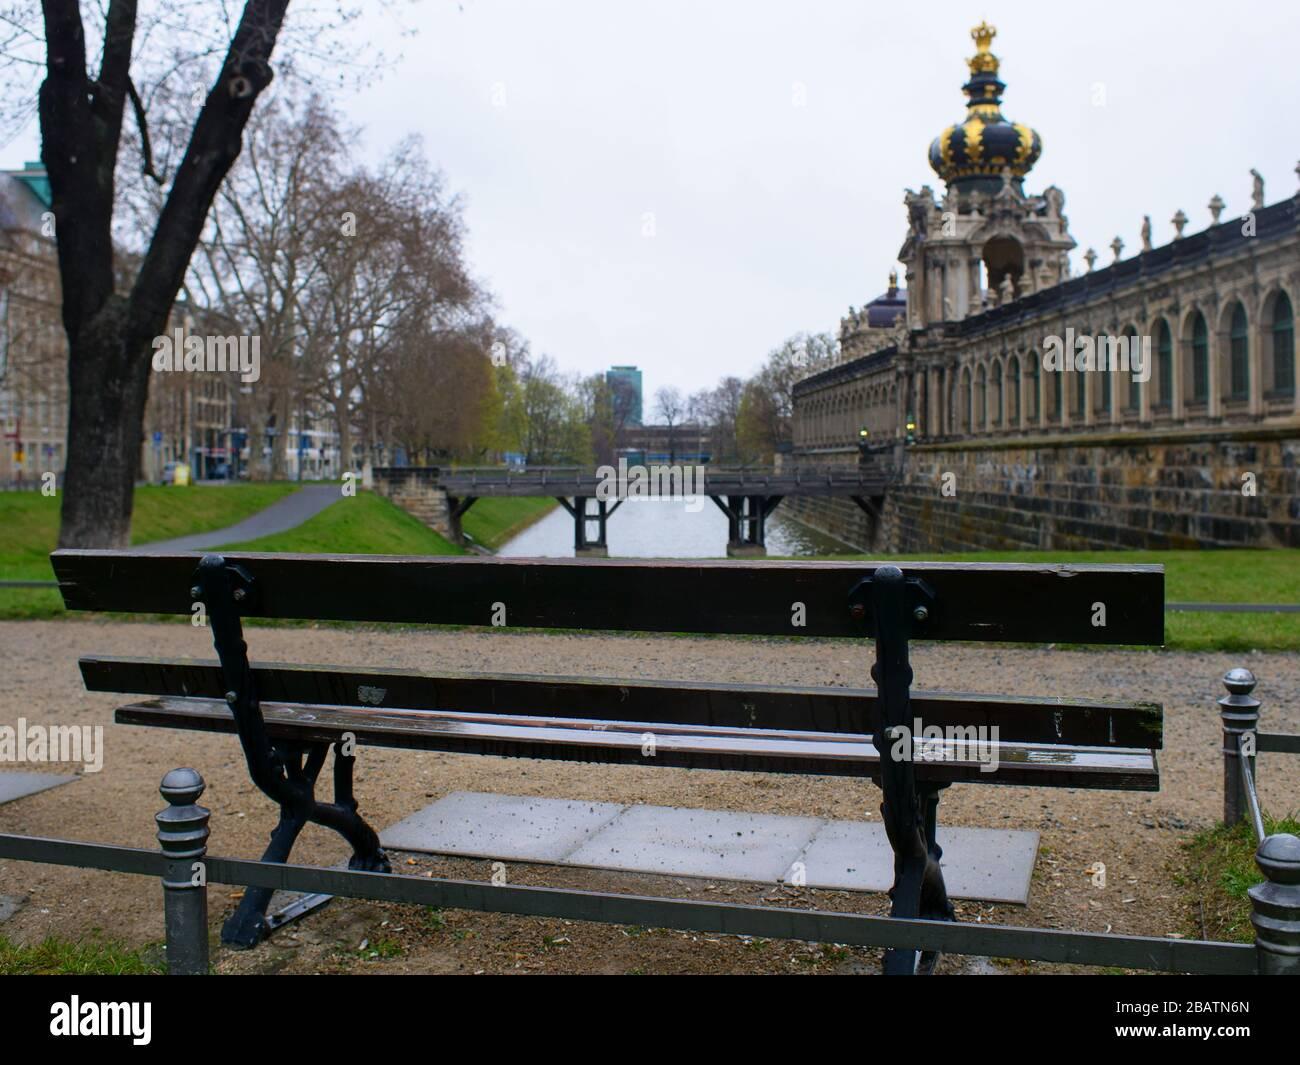 Leere Parkbänke während Coronavirus am Dresden Zwinger Teich Zwingerteich COVID-19 bloqueo 2020 Foto de stock